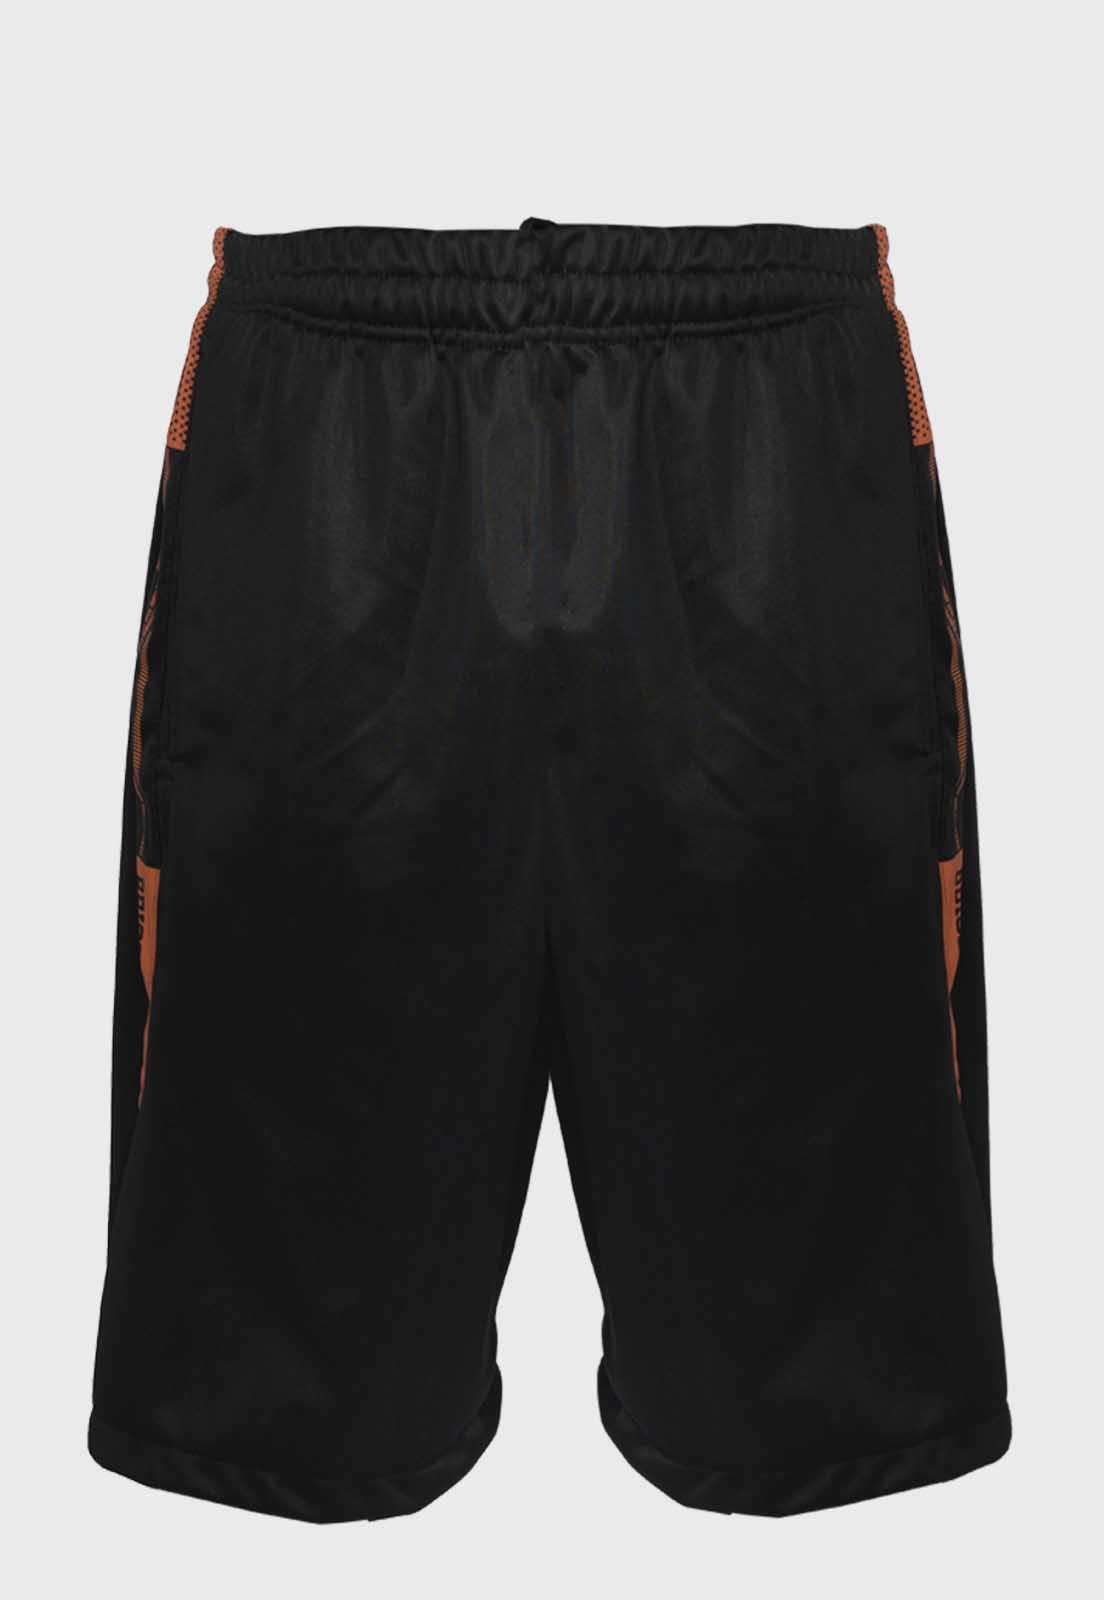 Bermuda Prison Streetwear Orange - Black